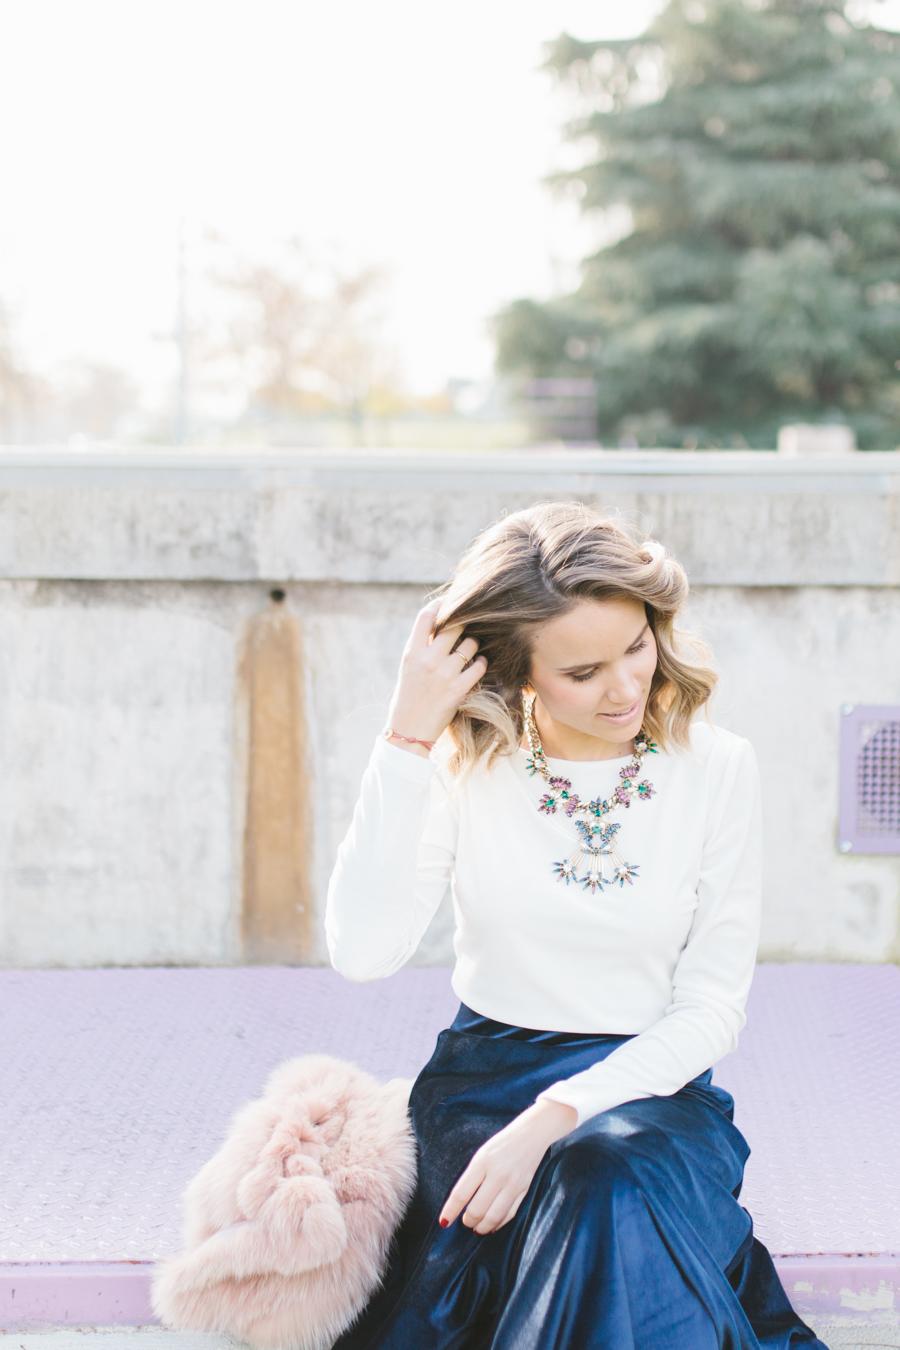 calista-one-blog-lista-de-bodas-online-invitada-perfecta-falda-terciopelo-13